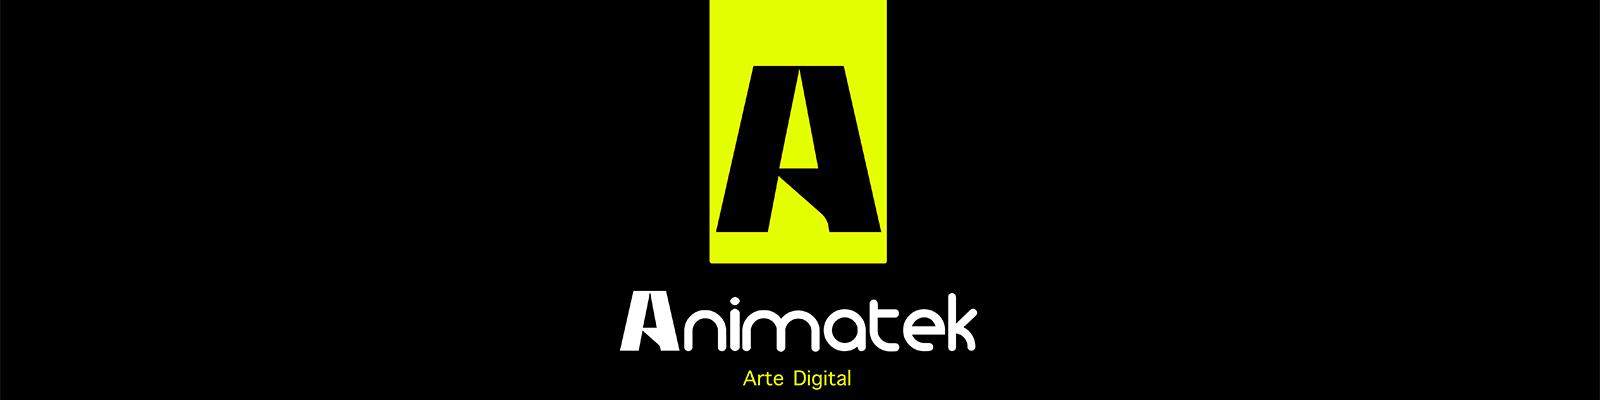 portada-logo-1-1600x400